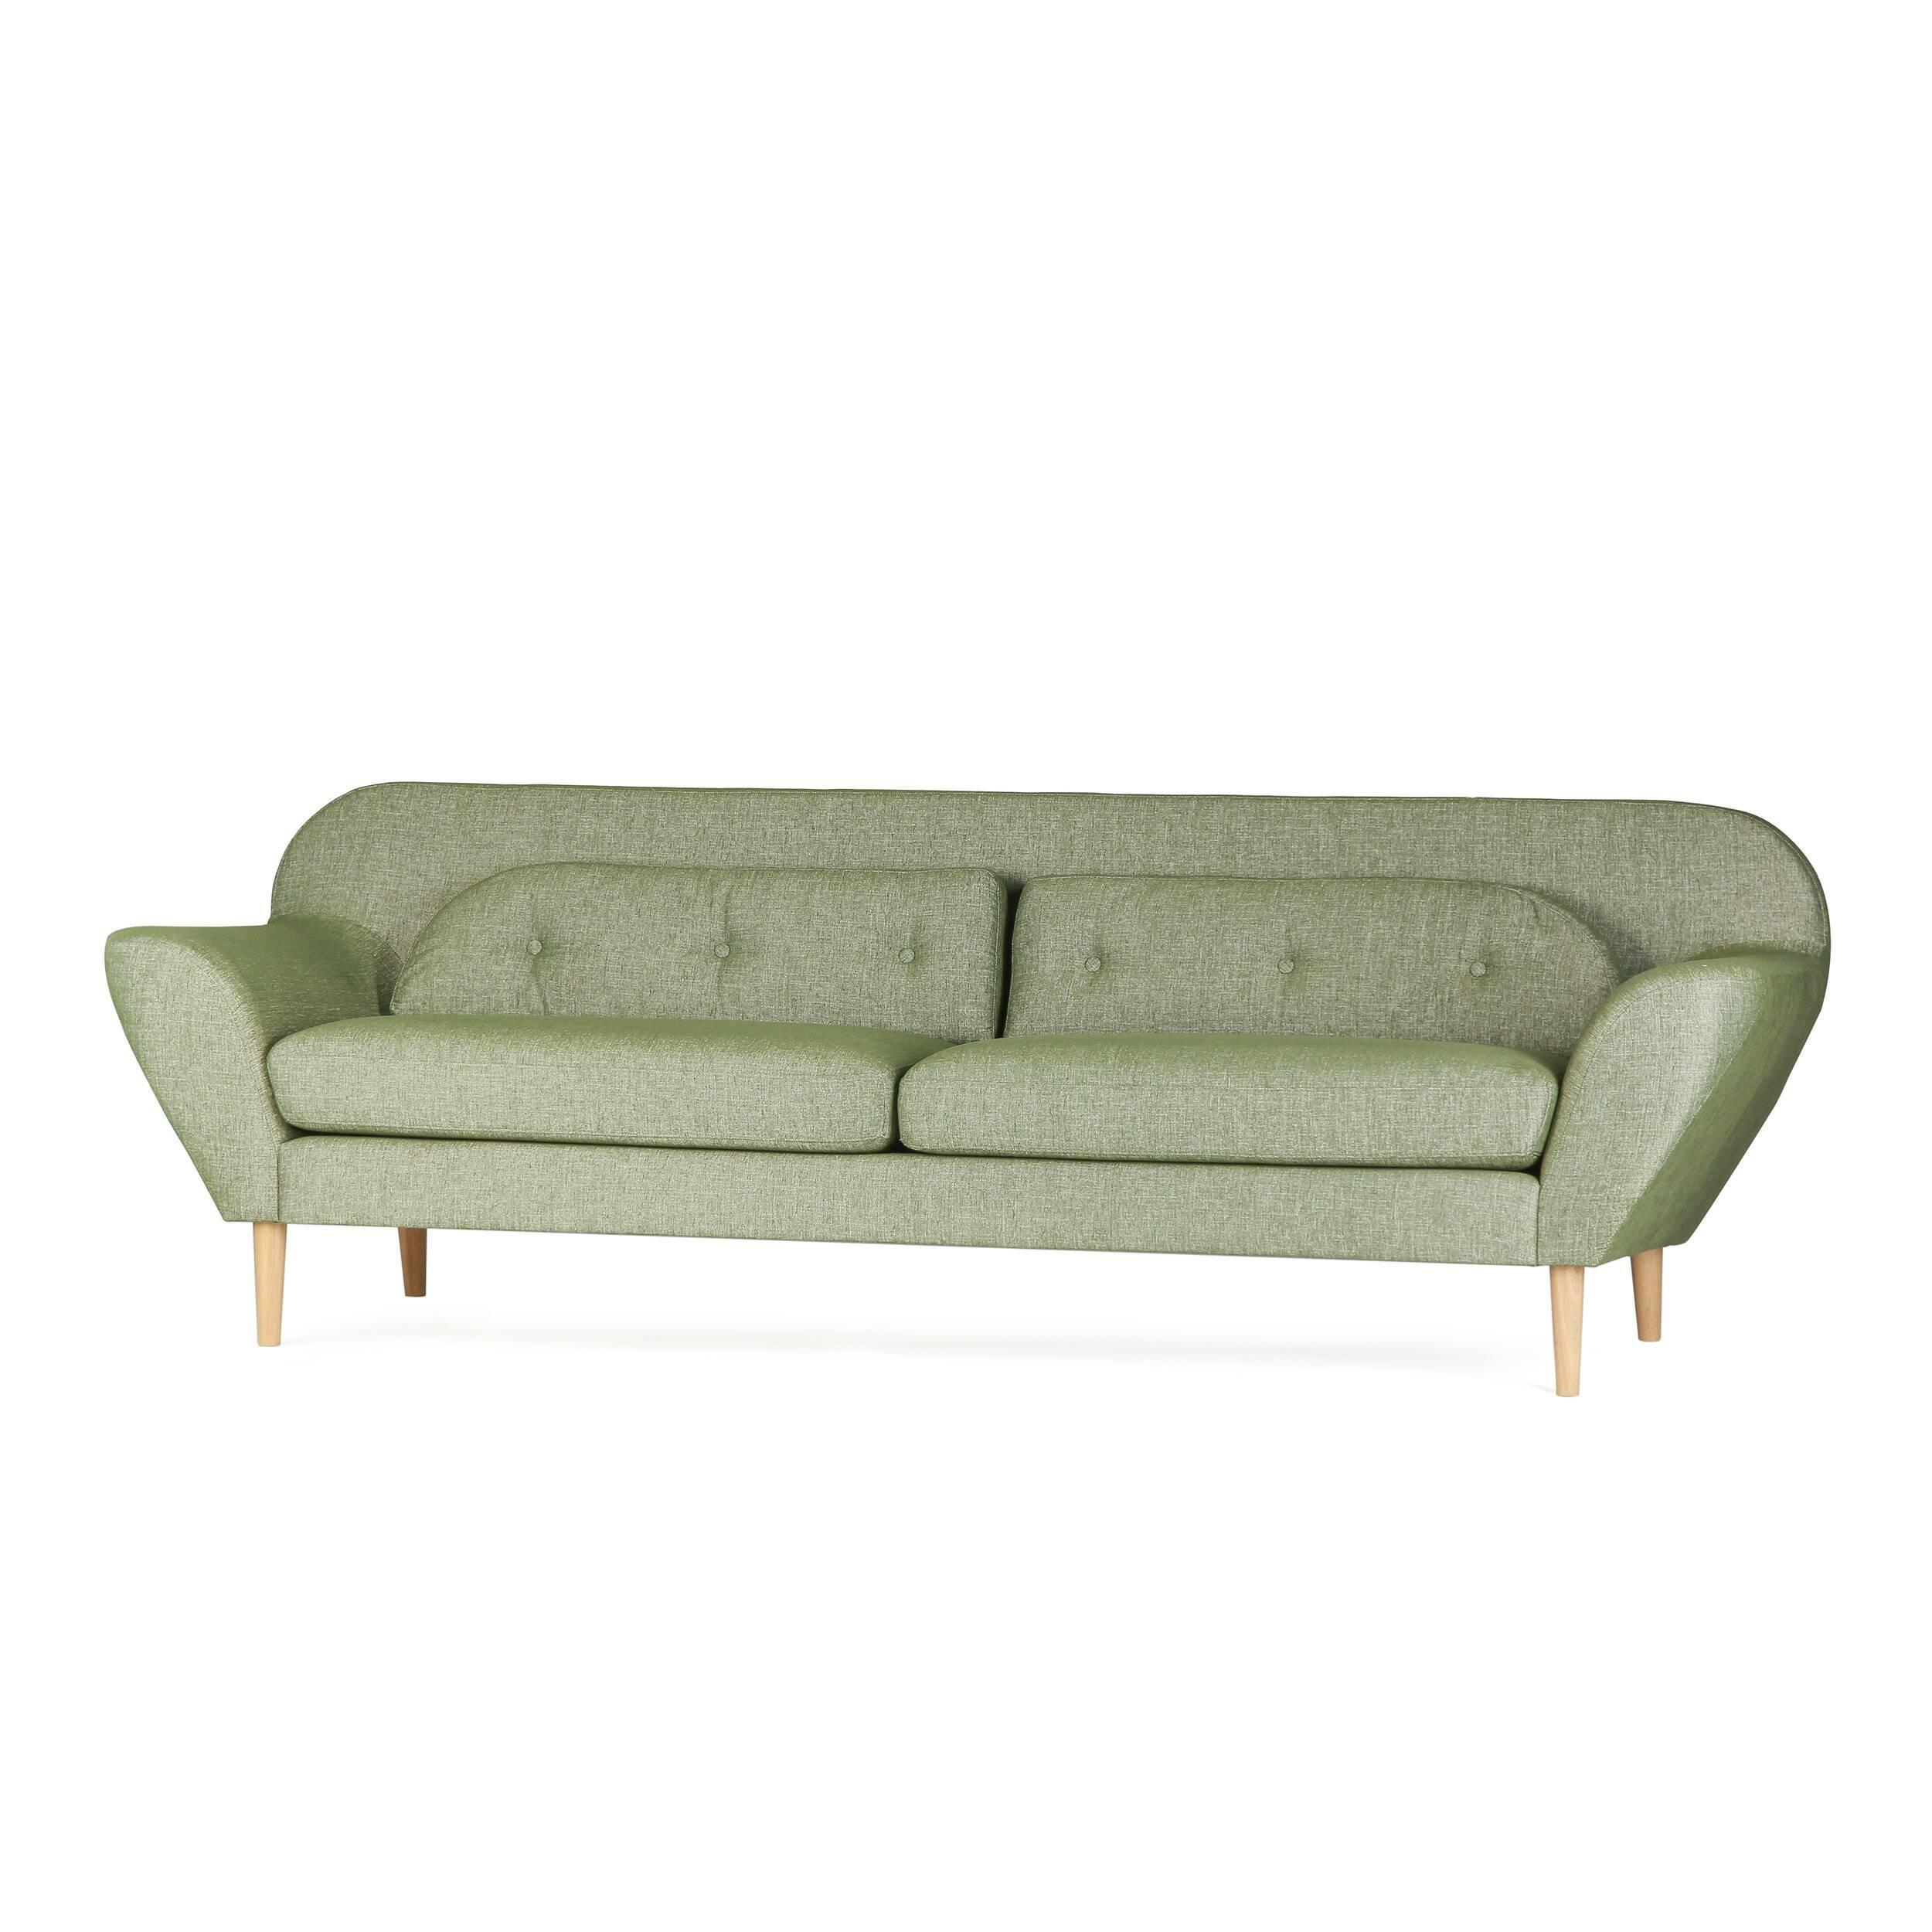 Купить Диван 3-х местный Poppy 1 E1811-0400-2S, Sits